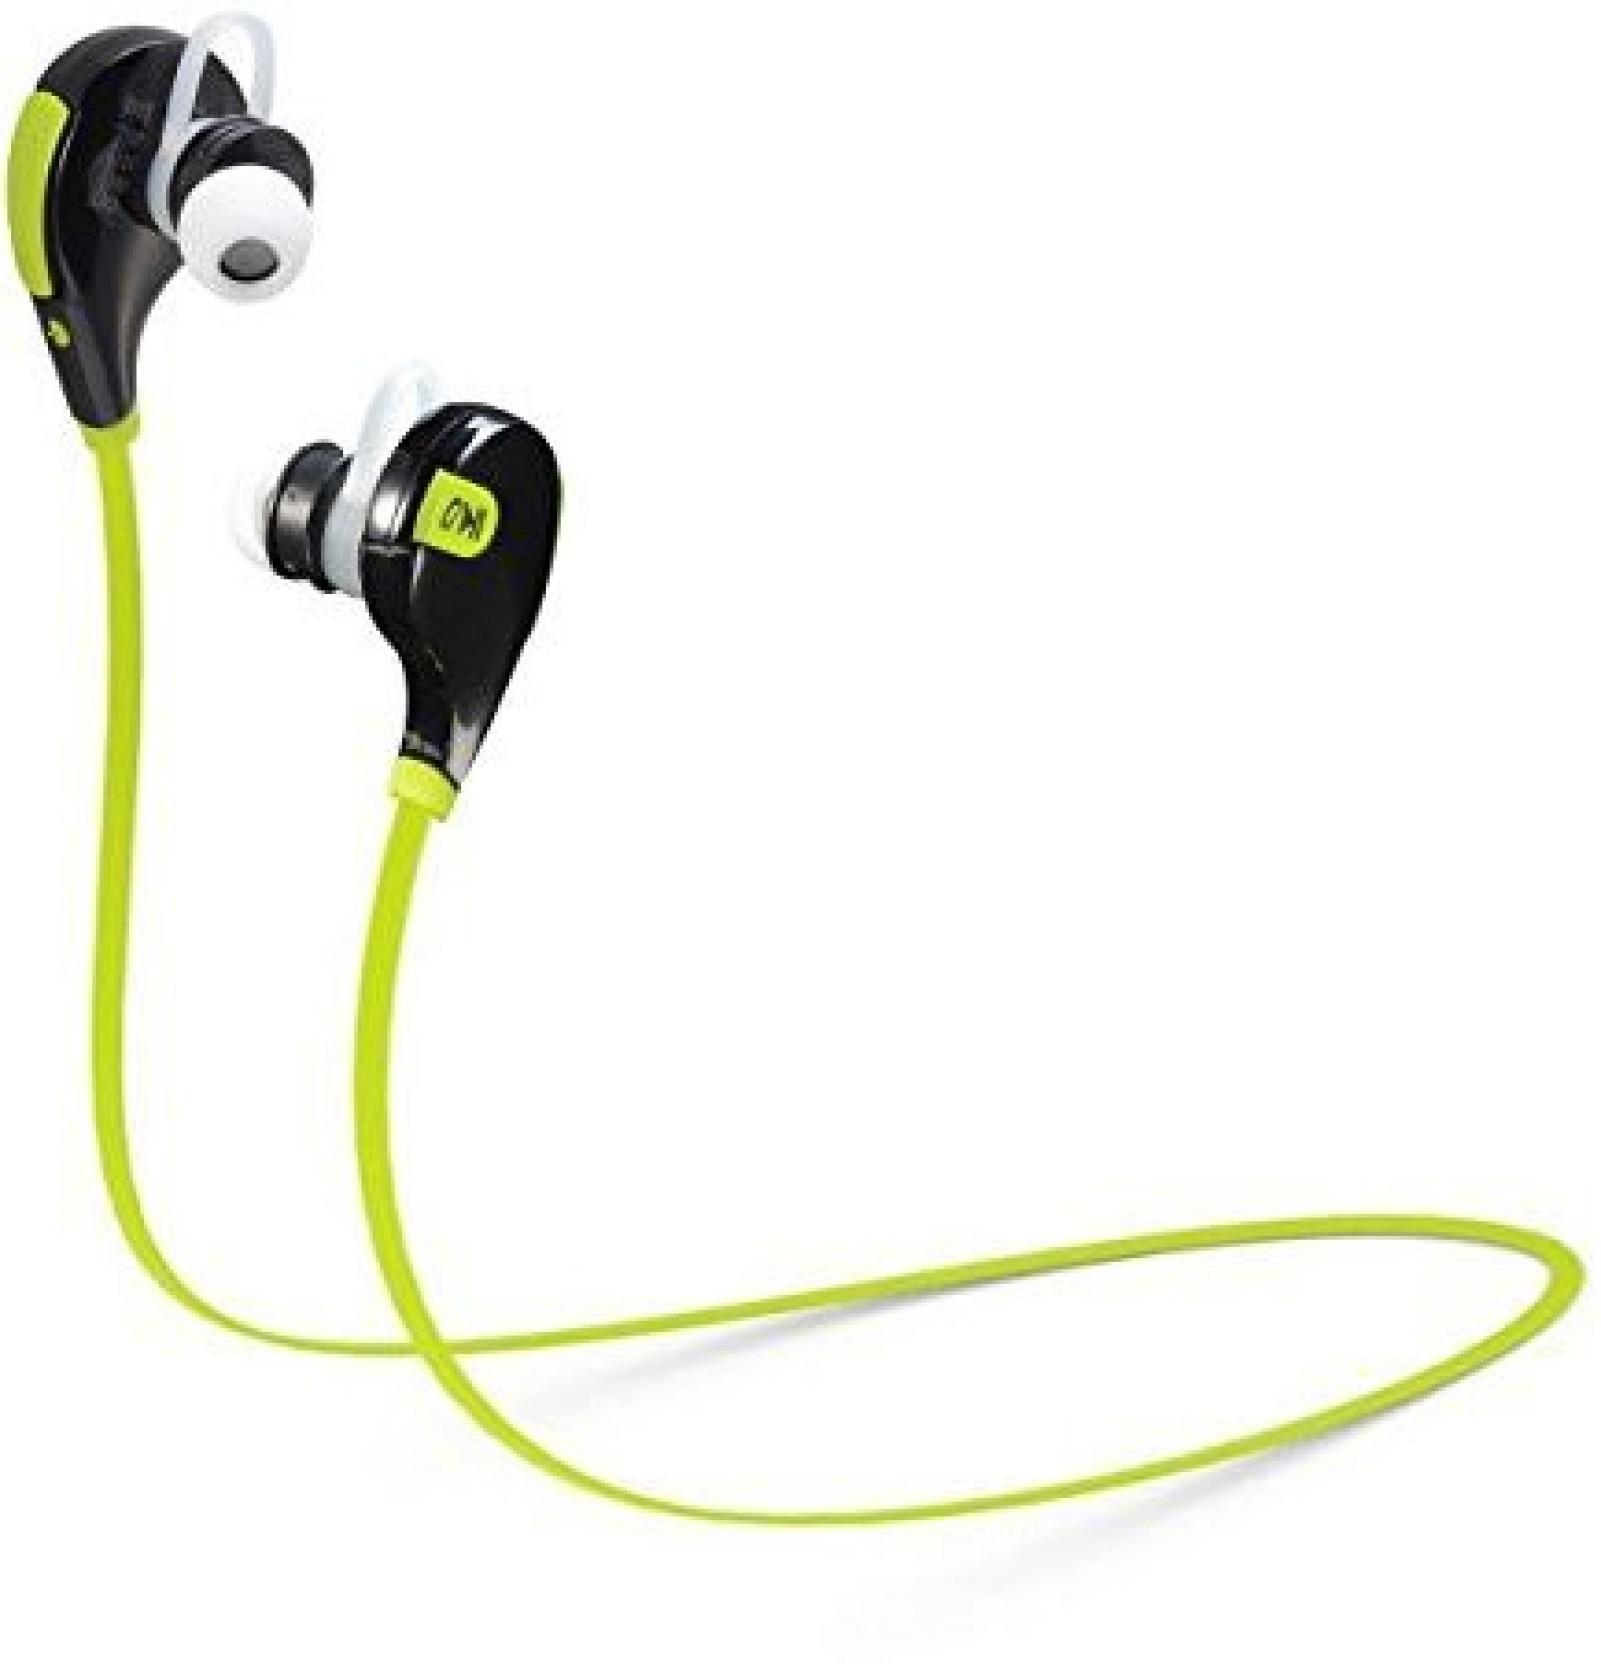 YYGIFT YYGIFT® Bluetooth 4.0 Wireless Stereo Noise Cancelling Headphones Jogger Running Sport Sweatproof Headphones Earbuds Earphone Headset with AptX,Mic ...